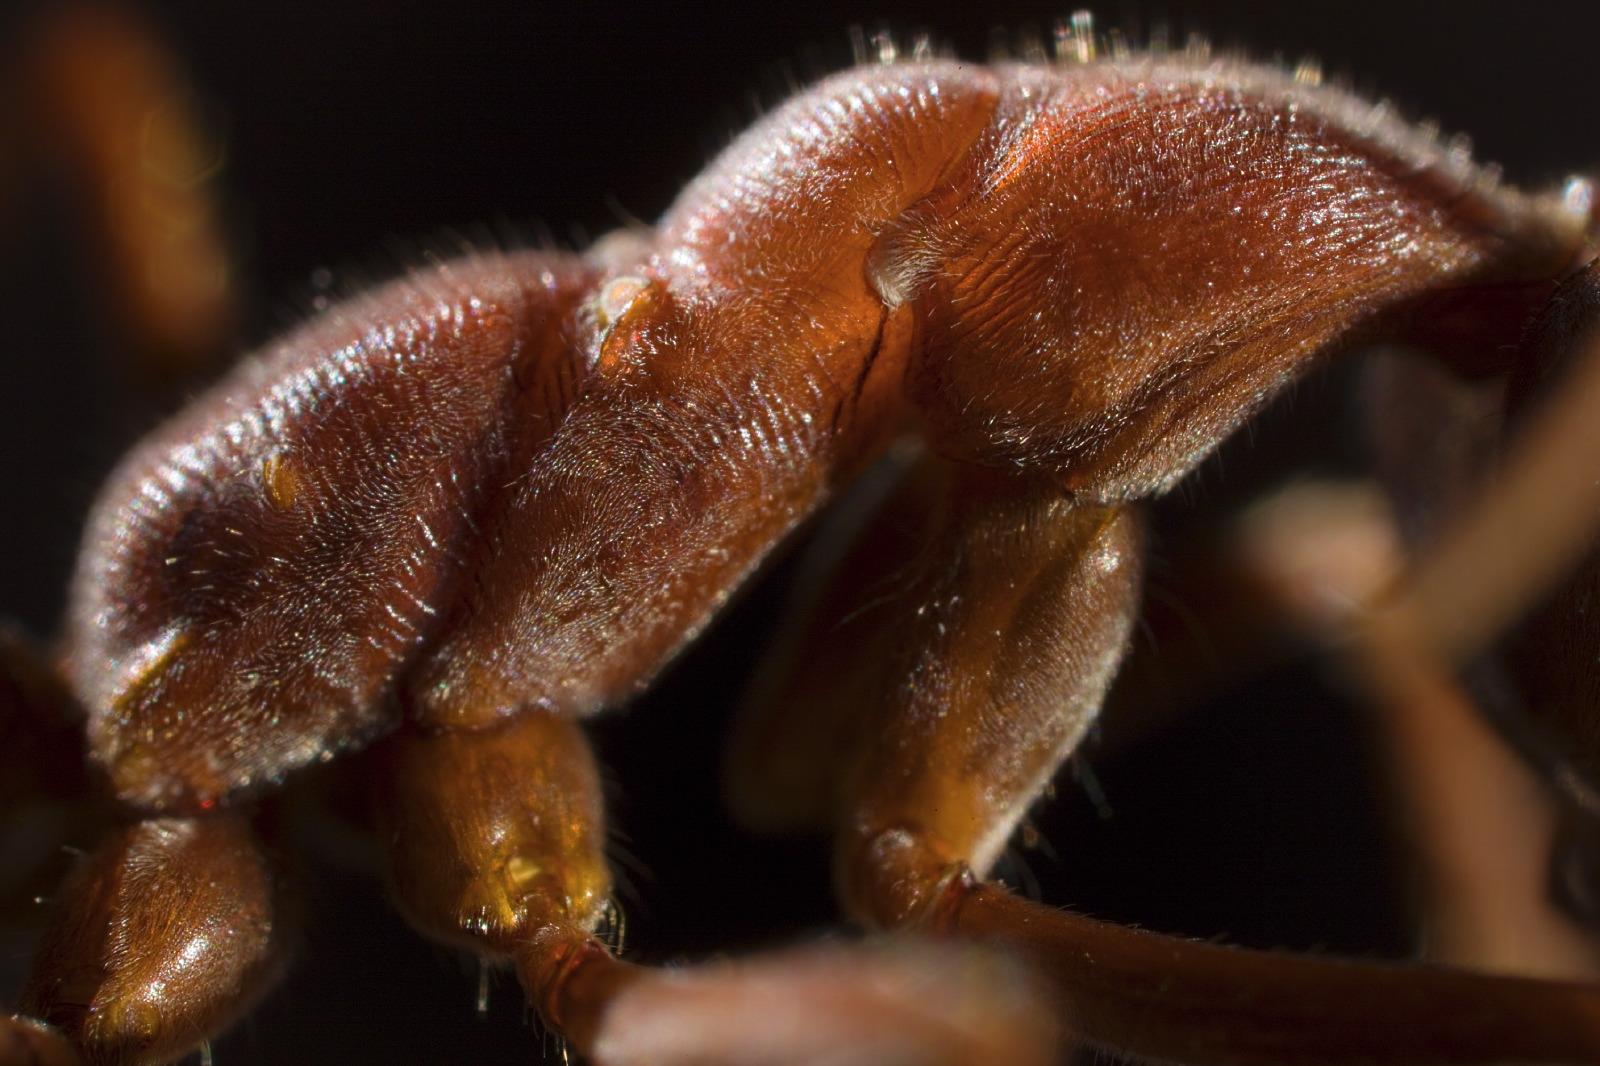 Myrmecia ant mosaic detail thorax